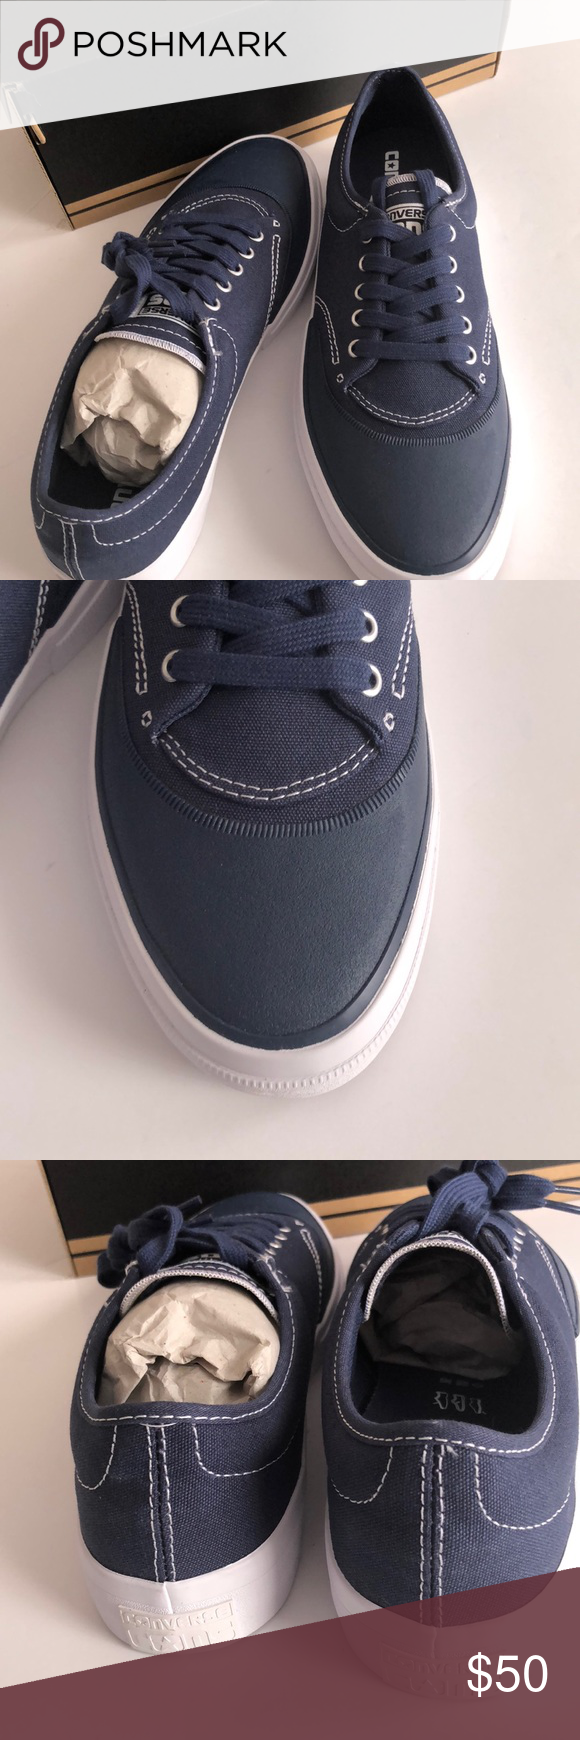 af8171a5c281 Converse Skateboard Shoes Crimson canvas OX navy Converse Skateboard Shoes.  Style    153464C Style